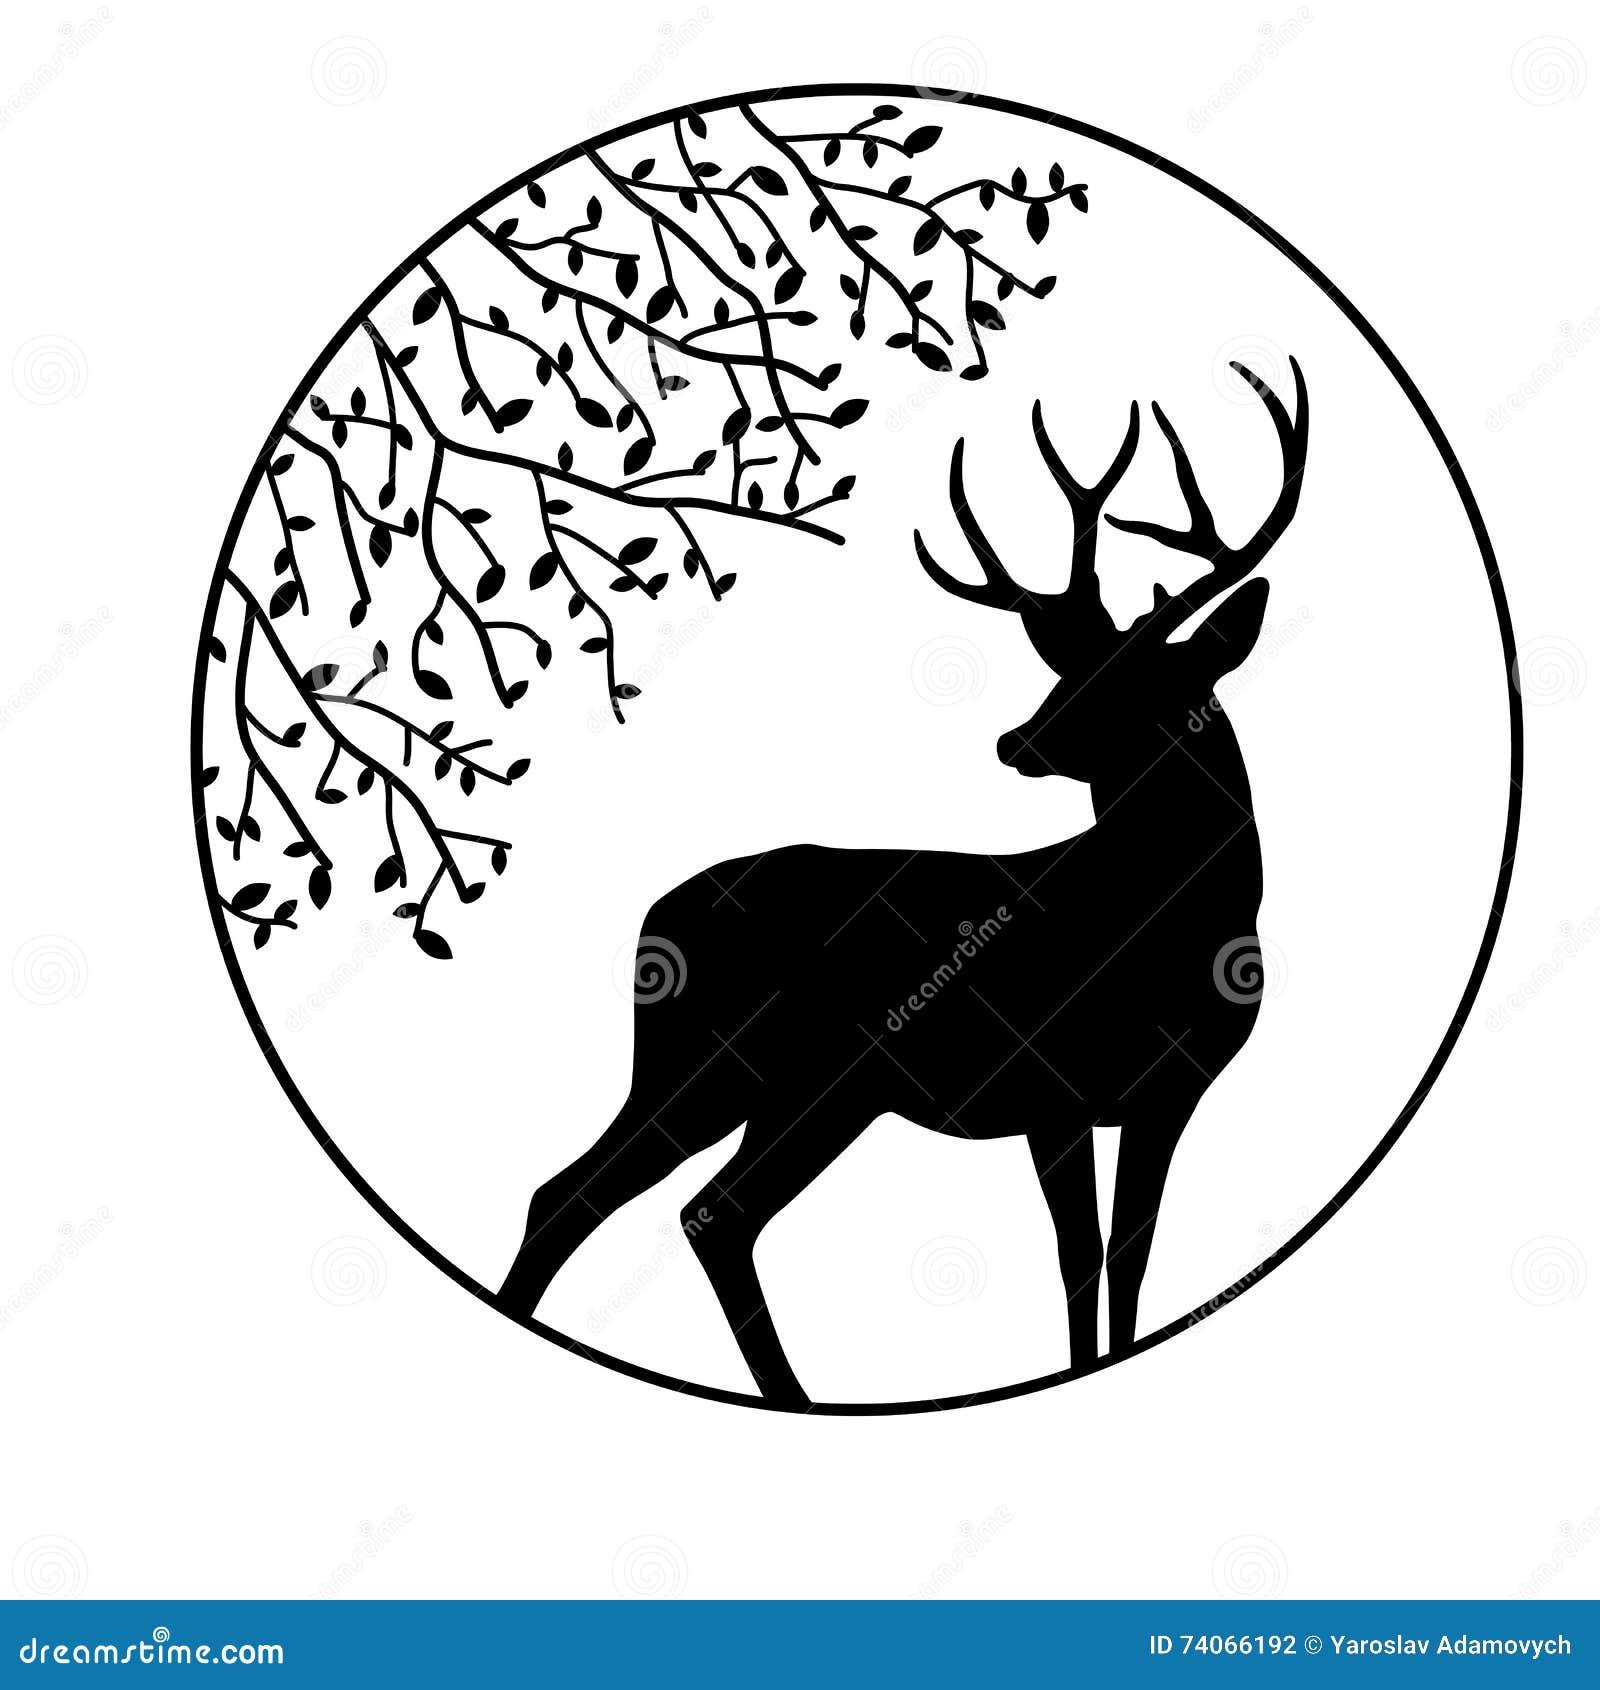 horny cartoons  illustrations  u0026 vector stock images